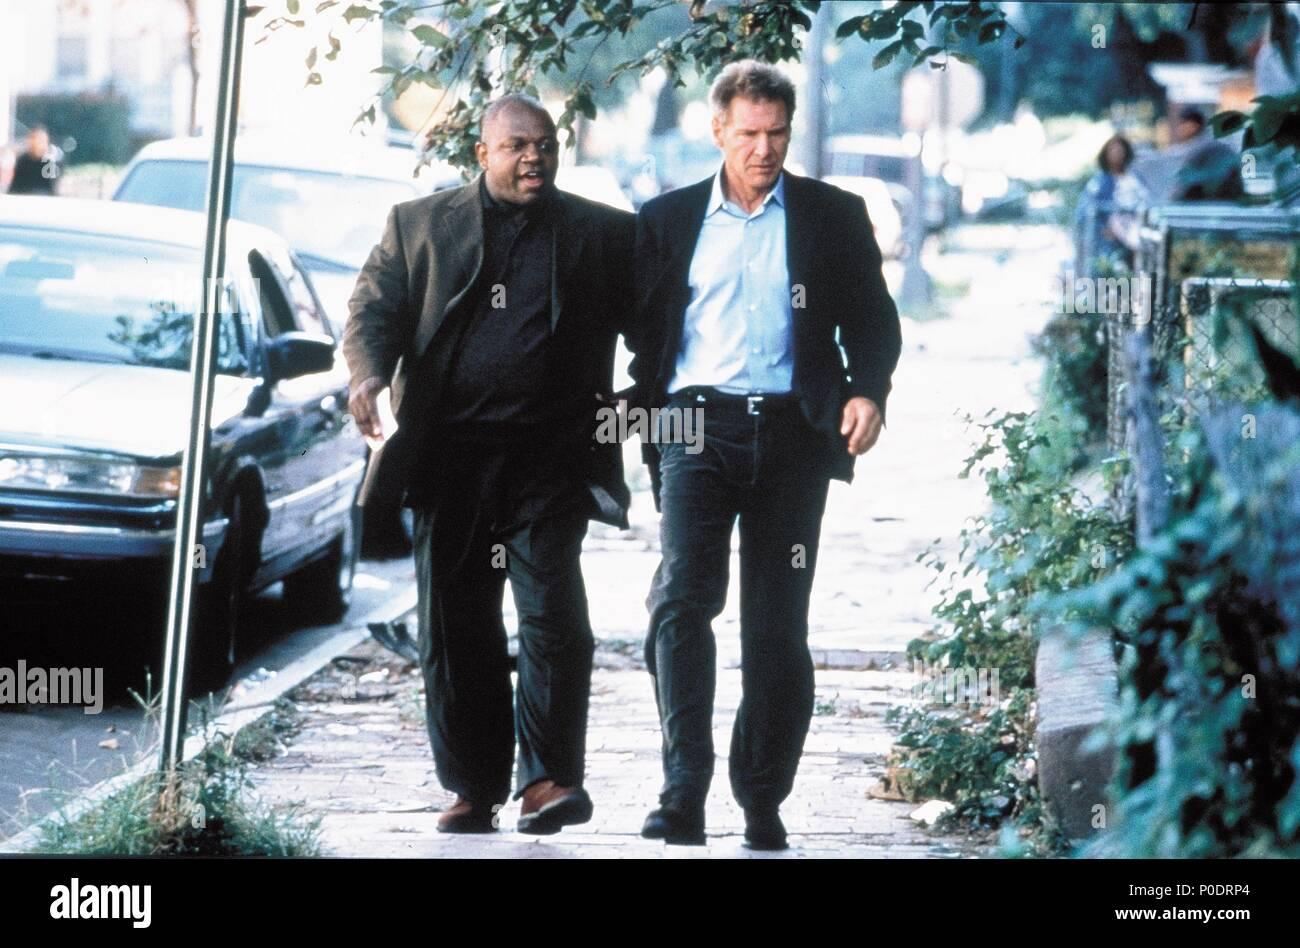 Original Film Title: RANDOM HEARTS.  English Title: RANDOM HEARTS.  Film Director: SYDNEY POLLACK.  Year: 1999.  Stars: HARRISON FORD. Credit: COLUMBIA PICTURES / Album - Stock Image